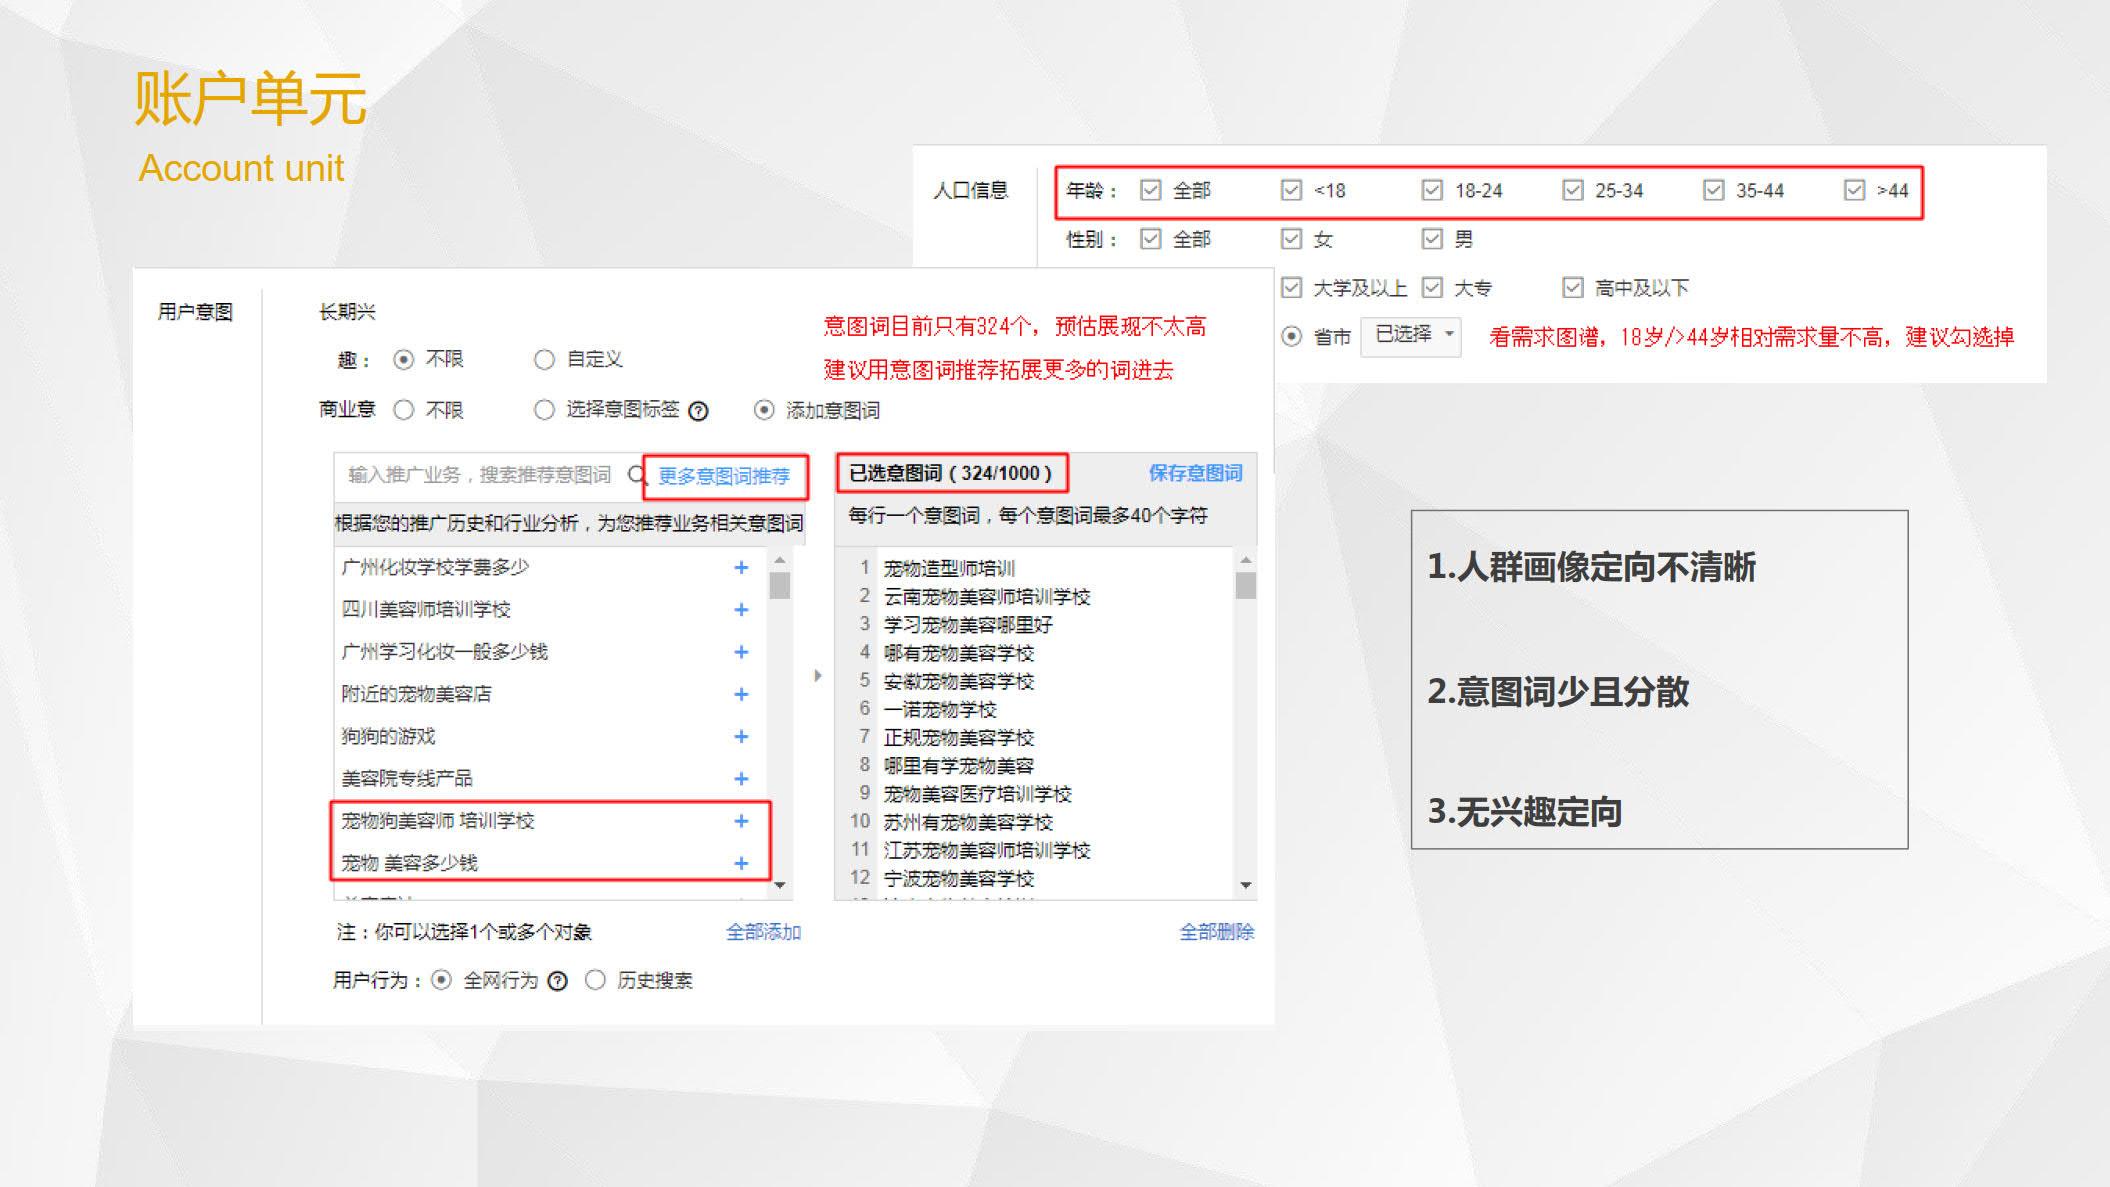 sh政轩-张燕惠_12.jpg